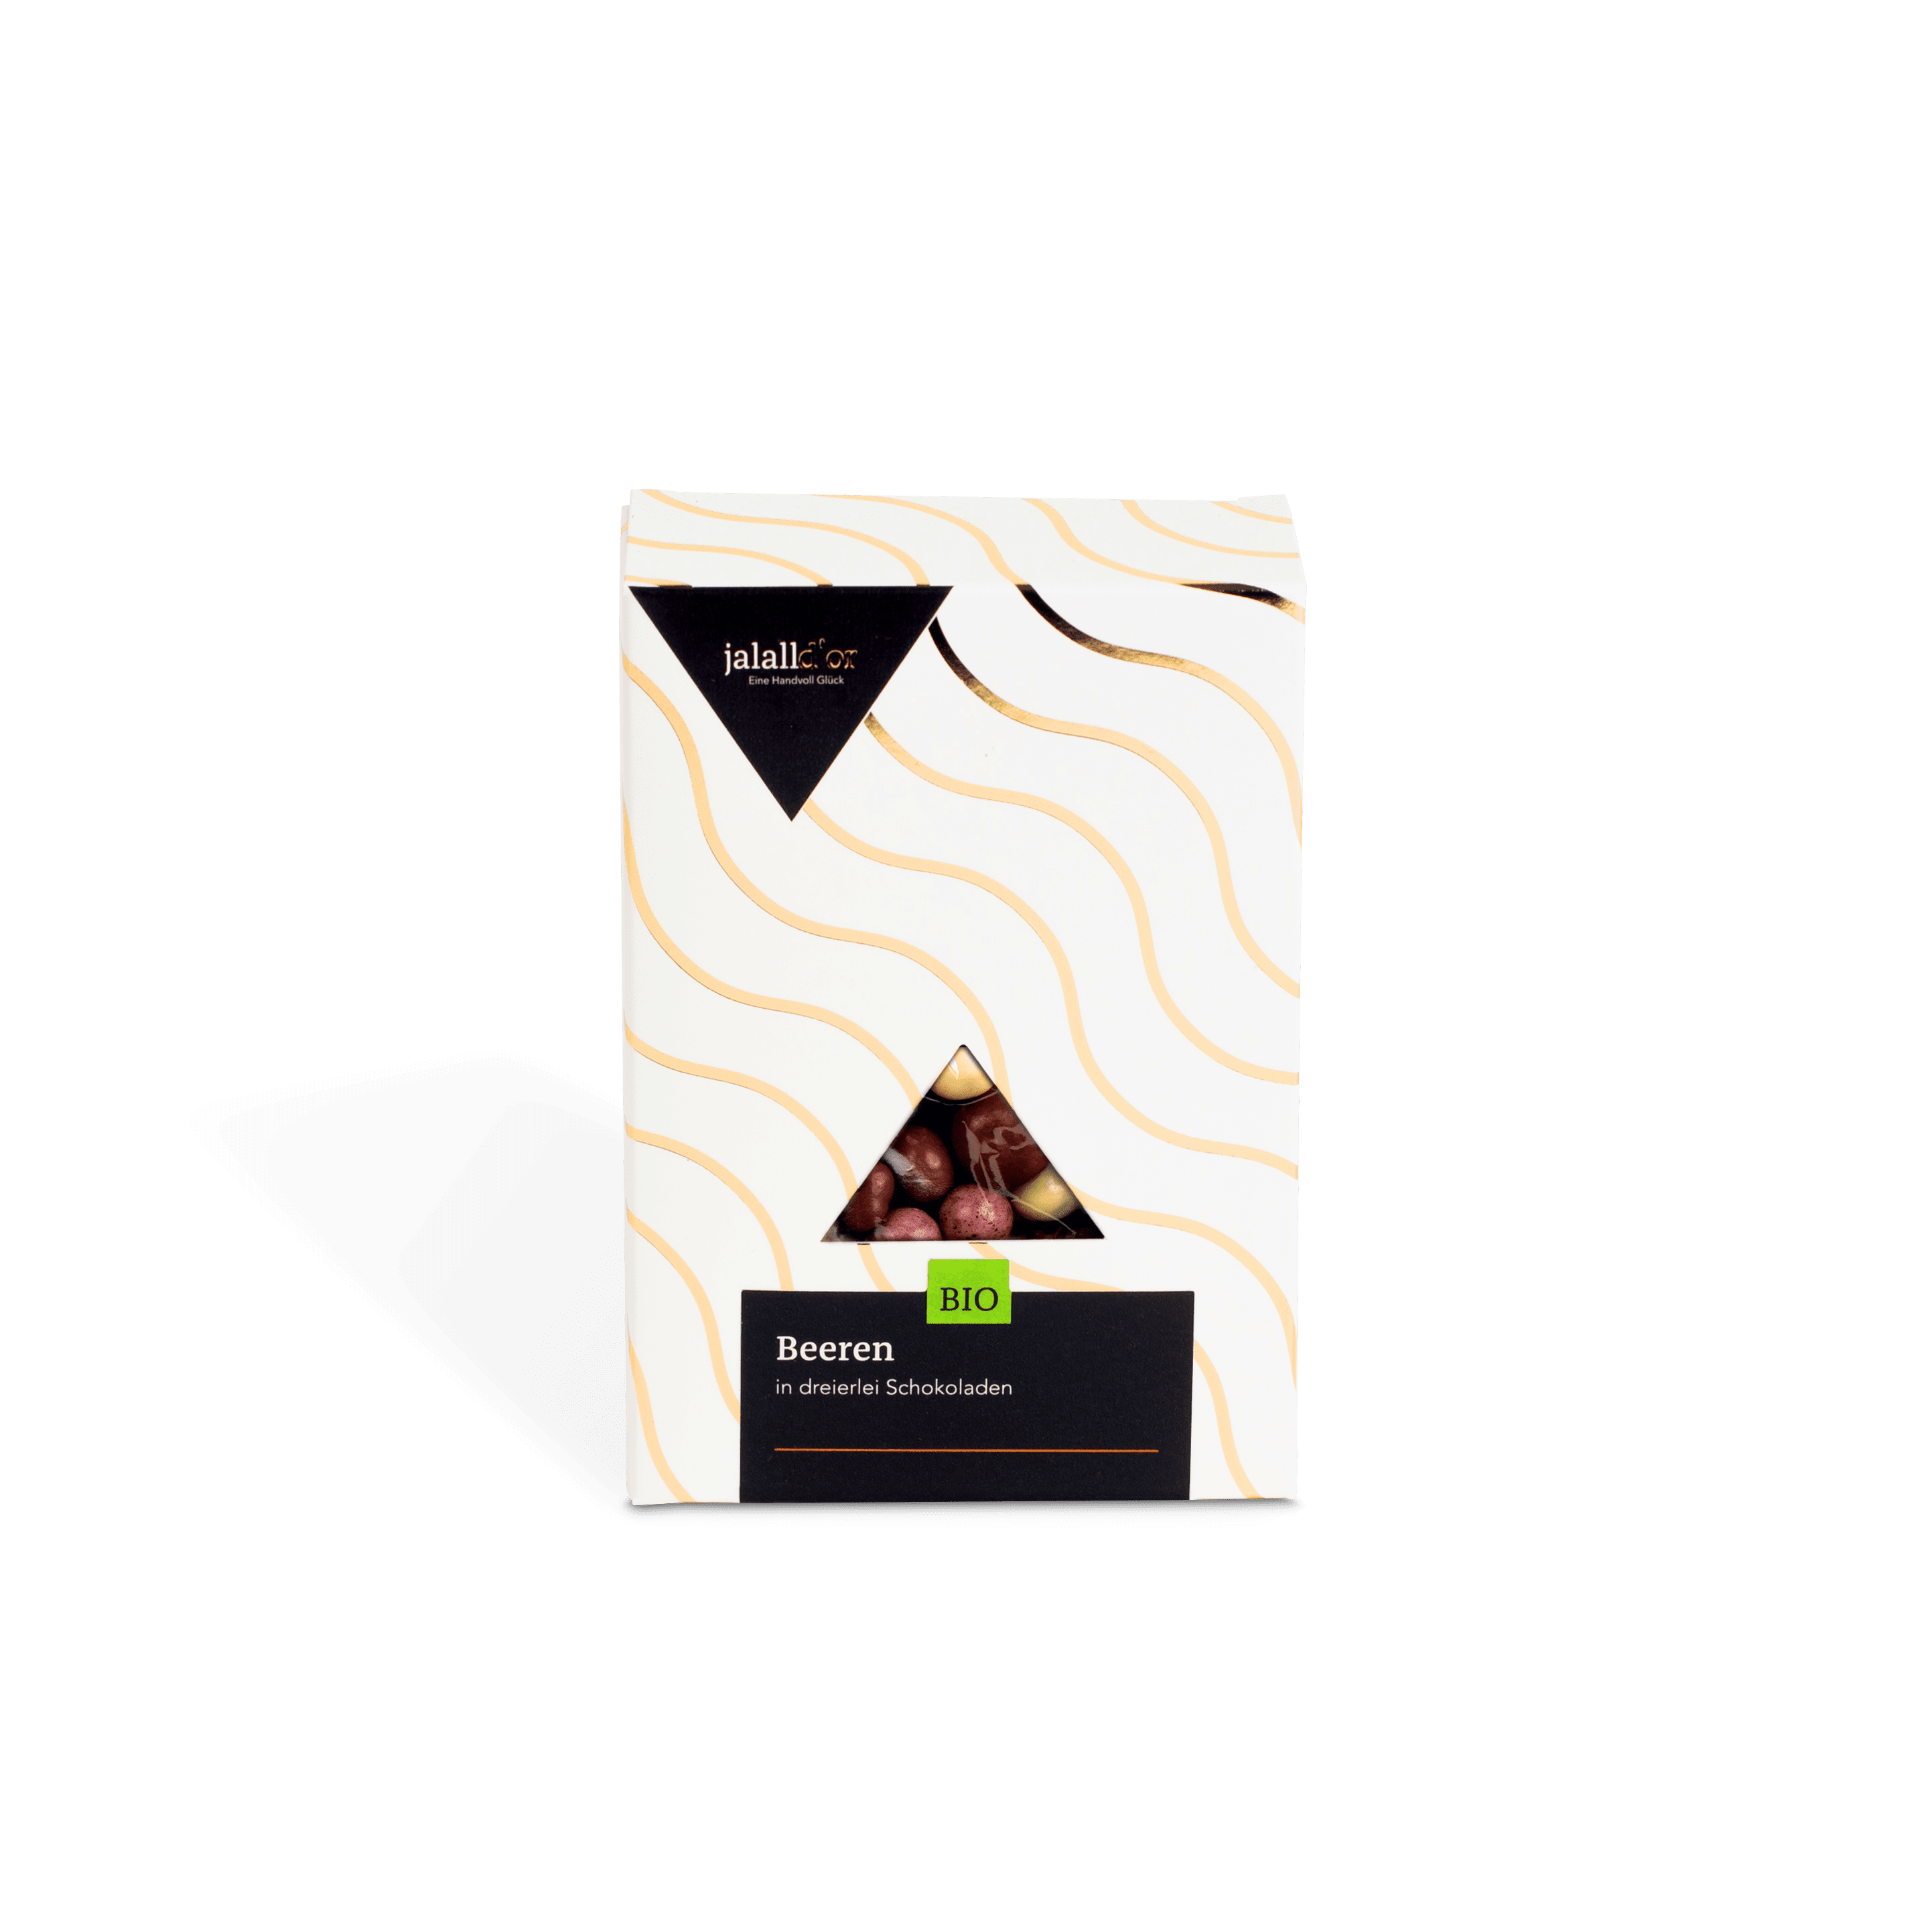 Beeren in dreierlei Schokoladen bio